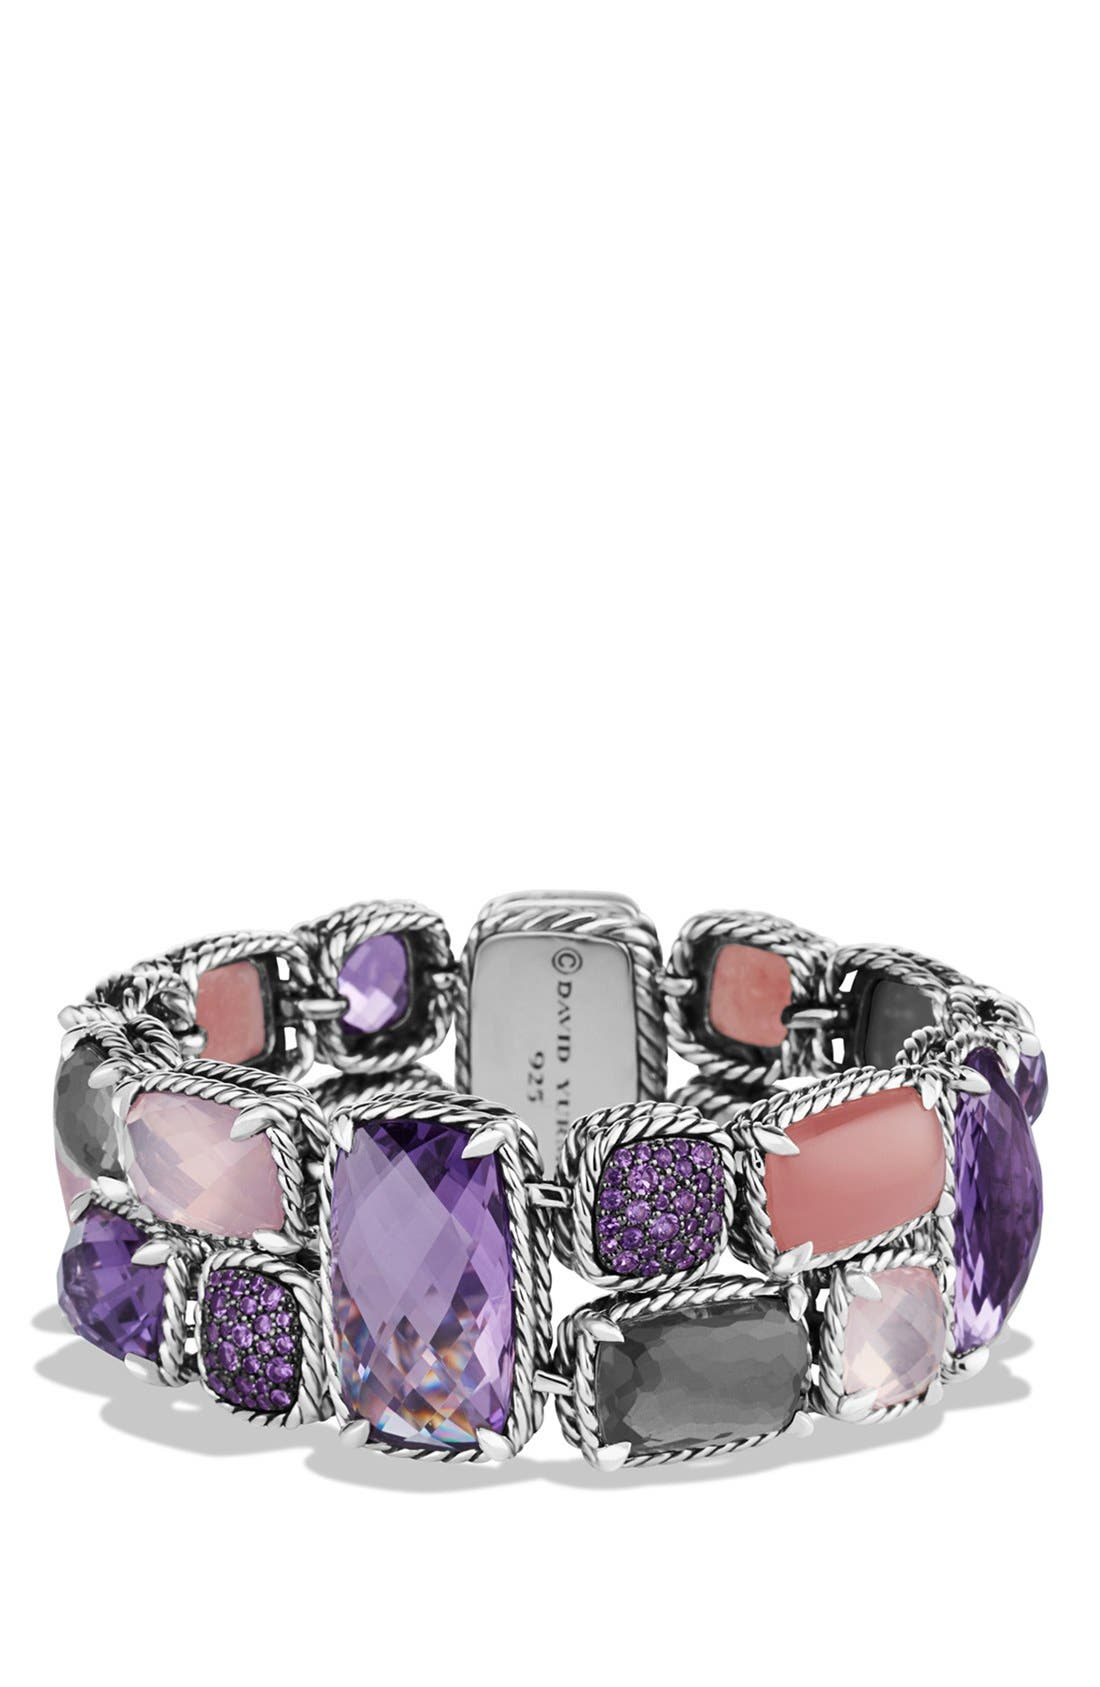 Alternate Image 1 Selected - David Yurman 'Mosaic - Châtelaine' Bracelet with Semiprecious Stones